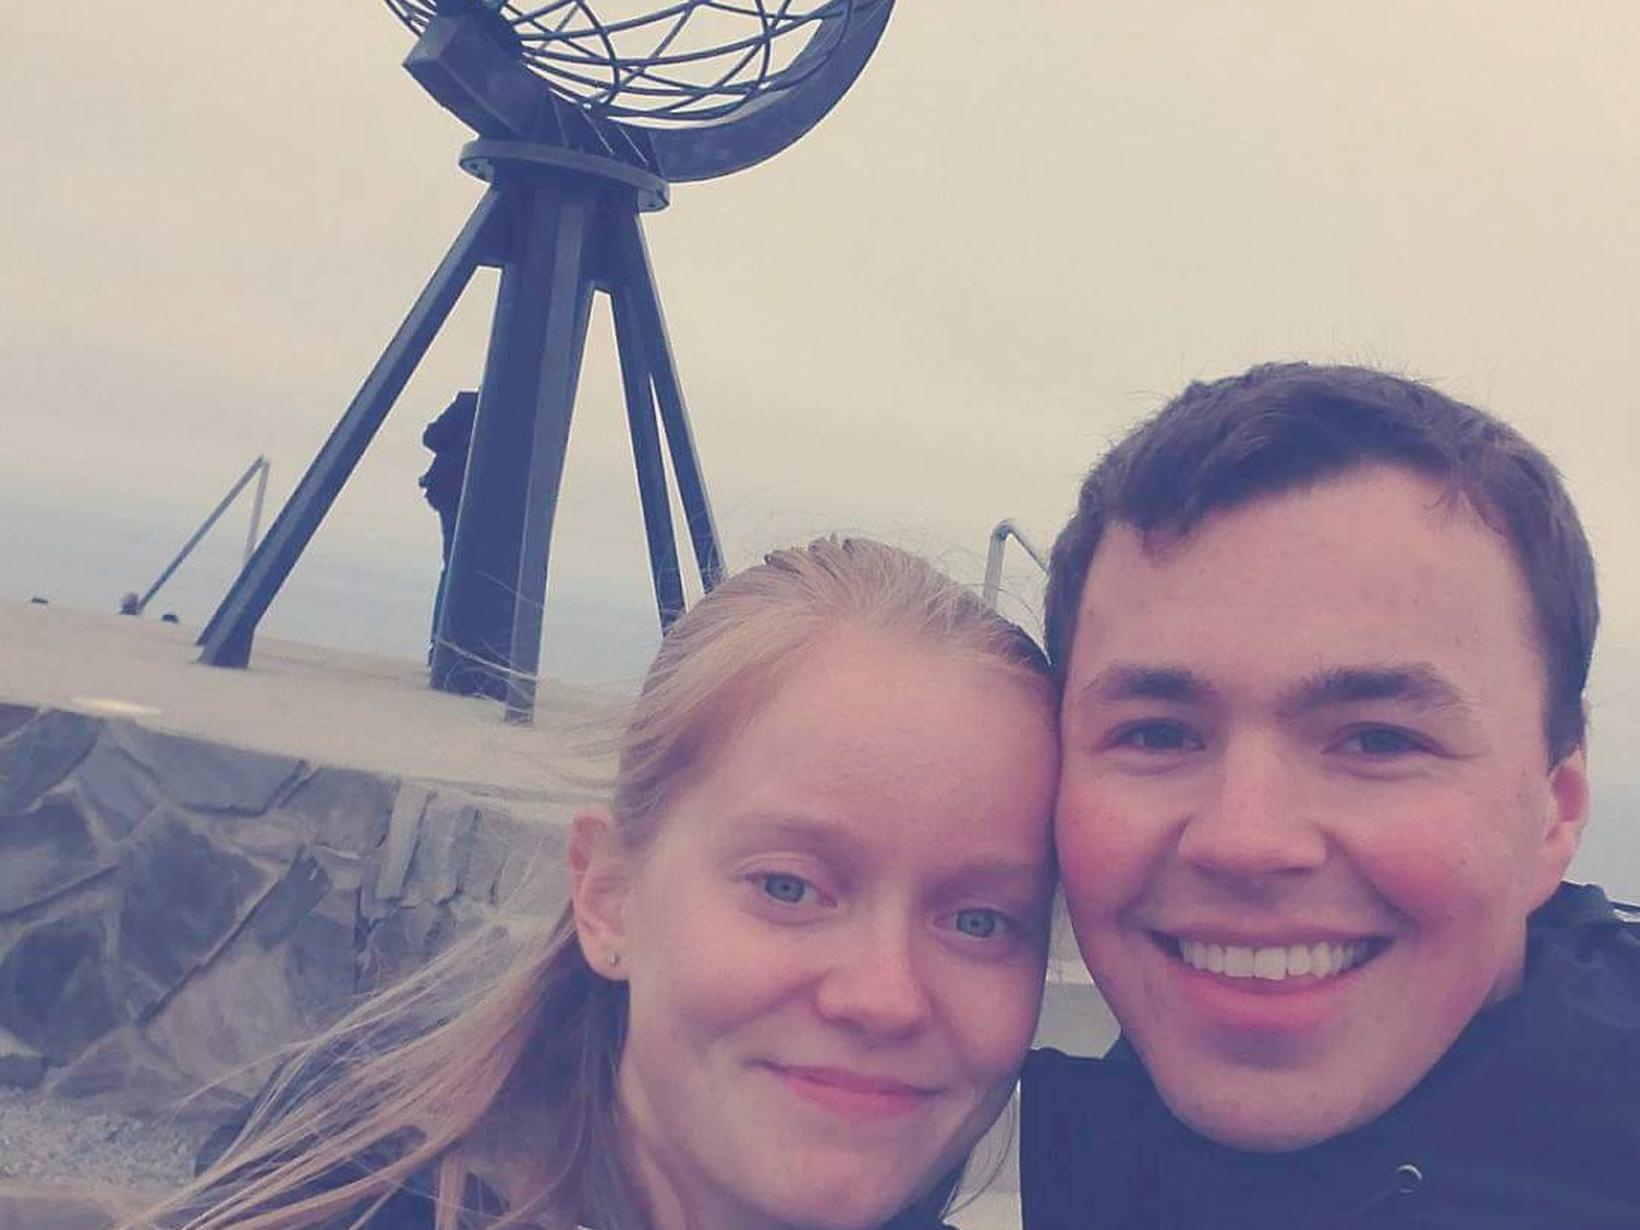 Runar & Andrea from Hammerfest, Norway